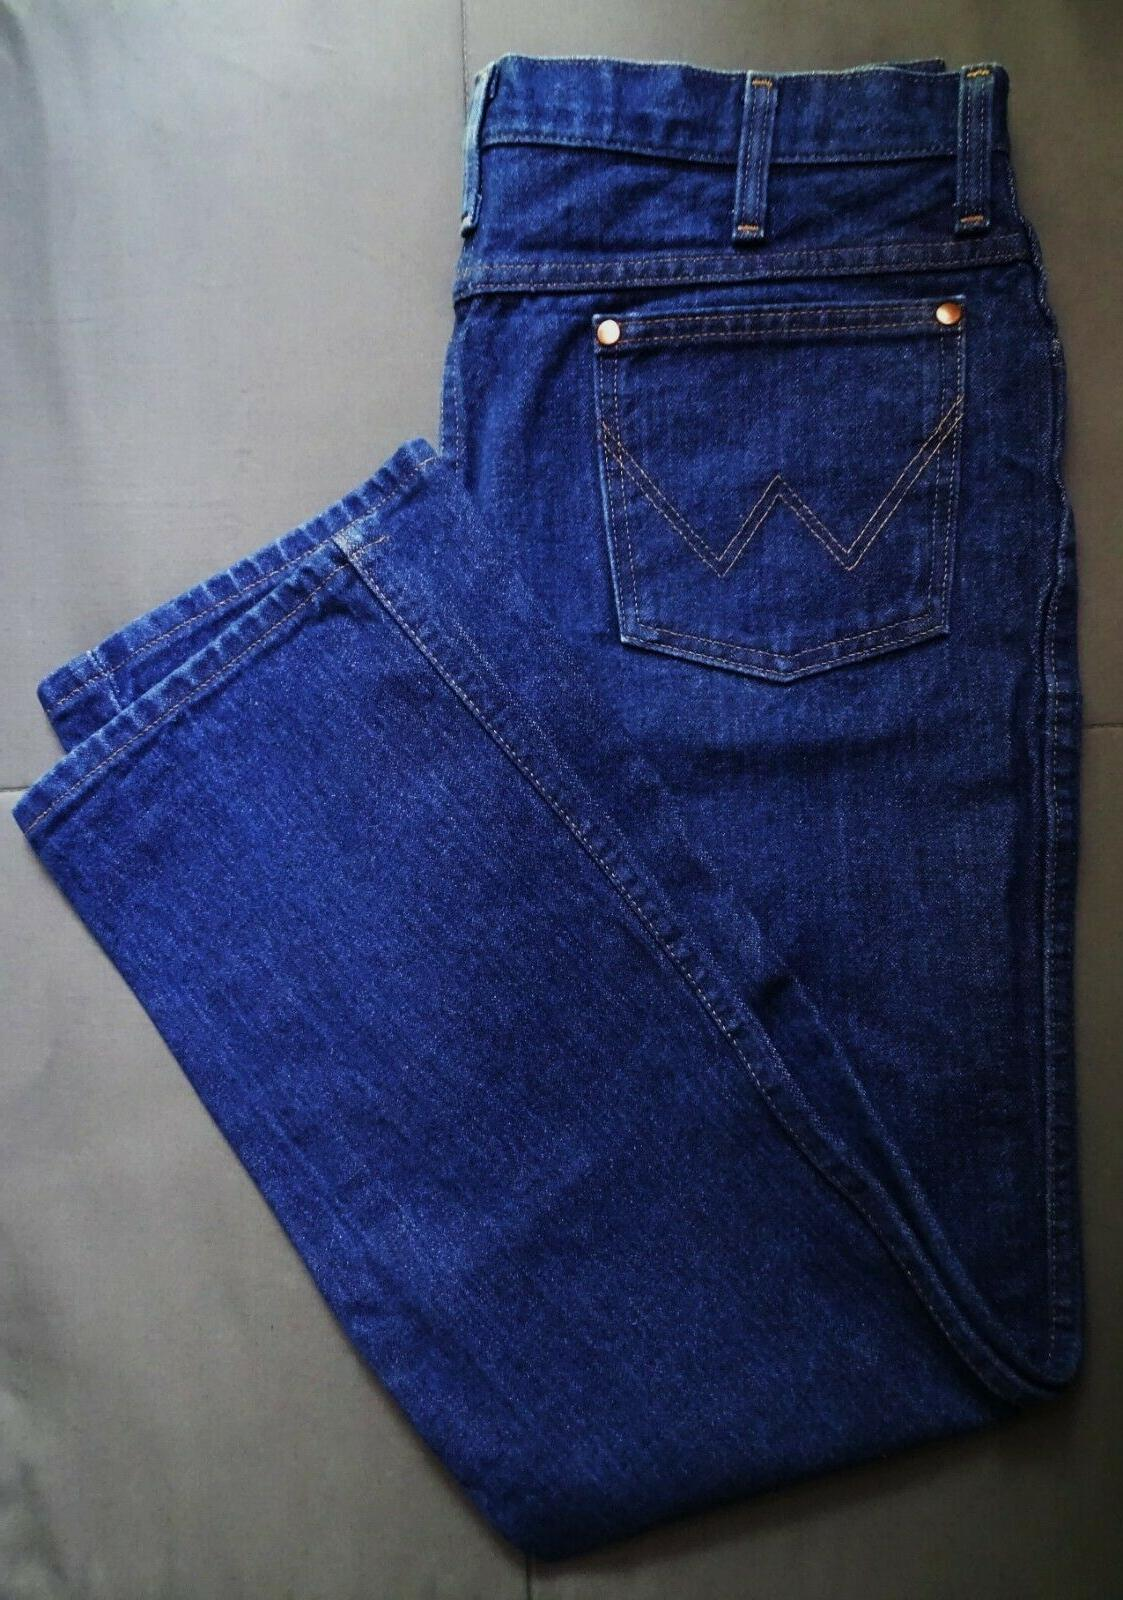 Wrangler Men's Cowboy Cut Slim Fit Jean, Prewashed Indigo, 3